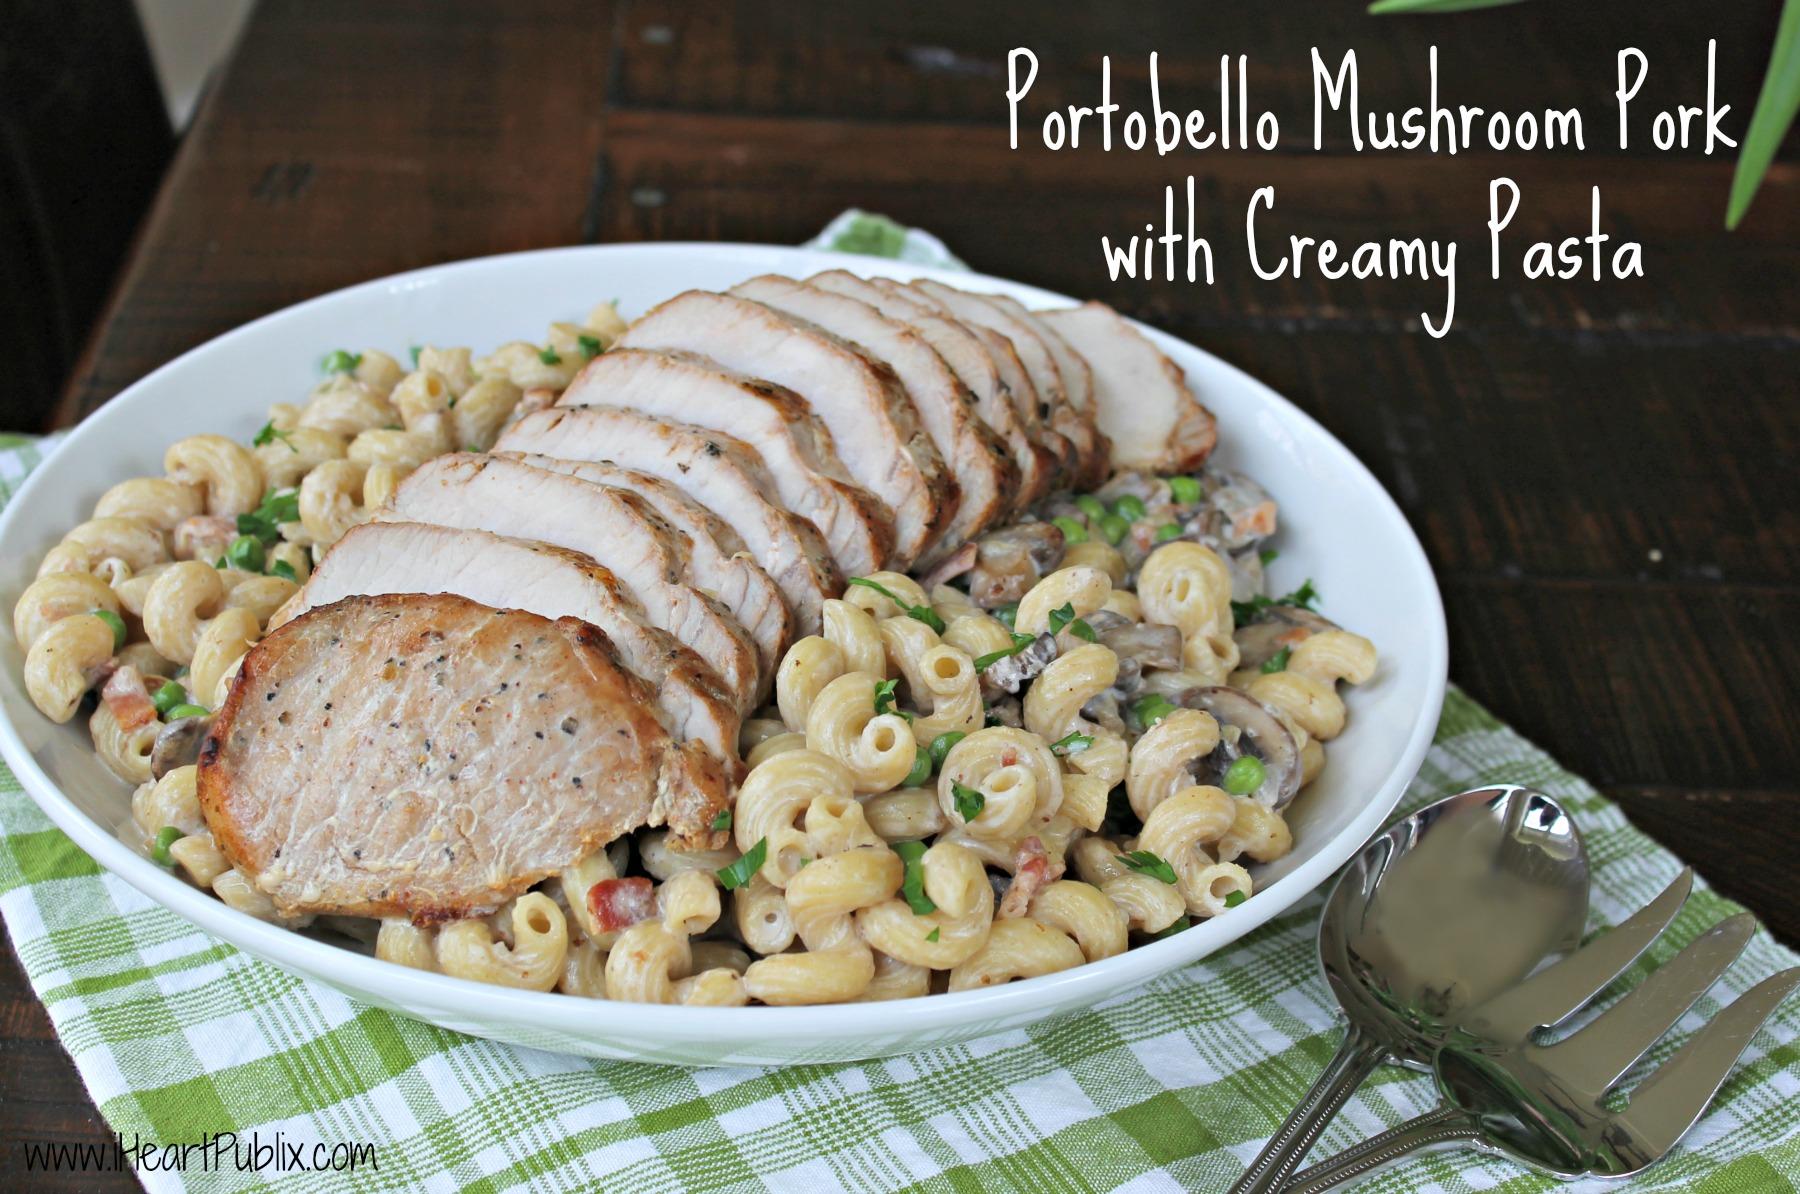 Portobello Mushroom Pork with Creamy Pasta